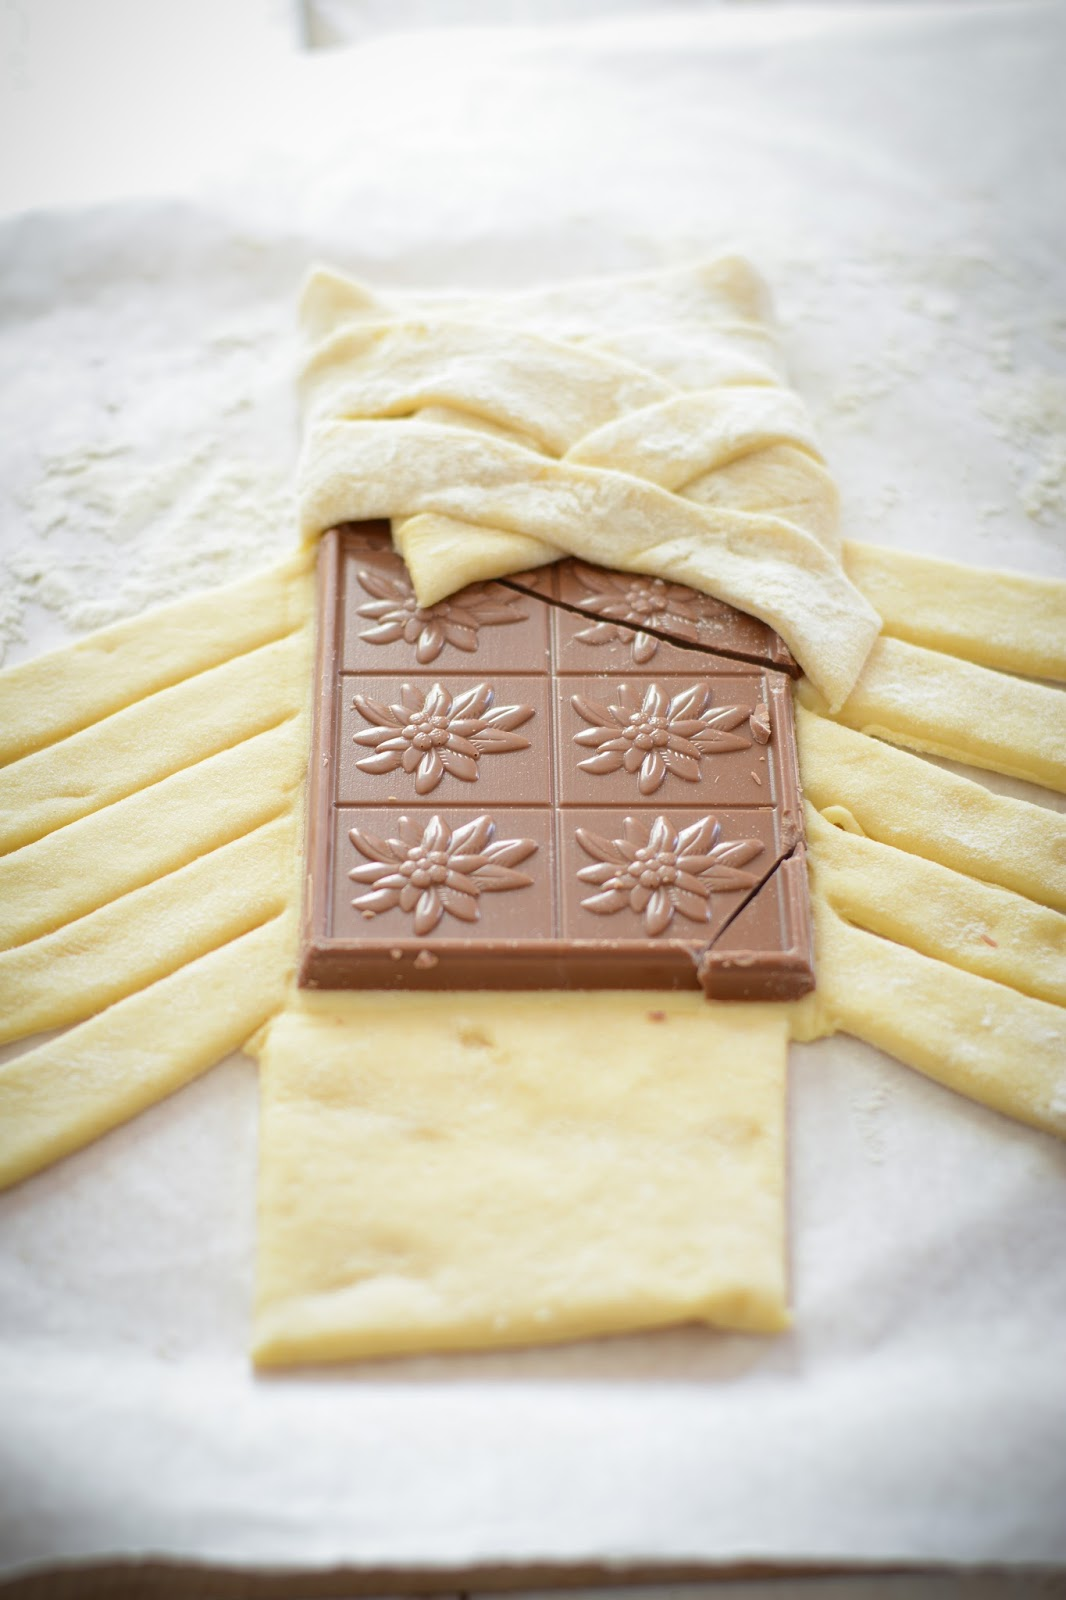 Chic chic chocolat tresse brioch e chocolat pistaches for 1 tablette de chocolat